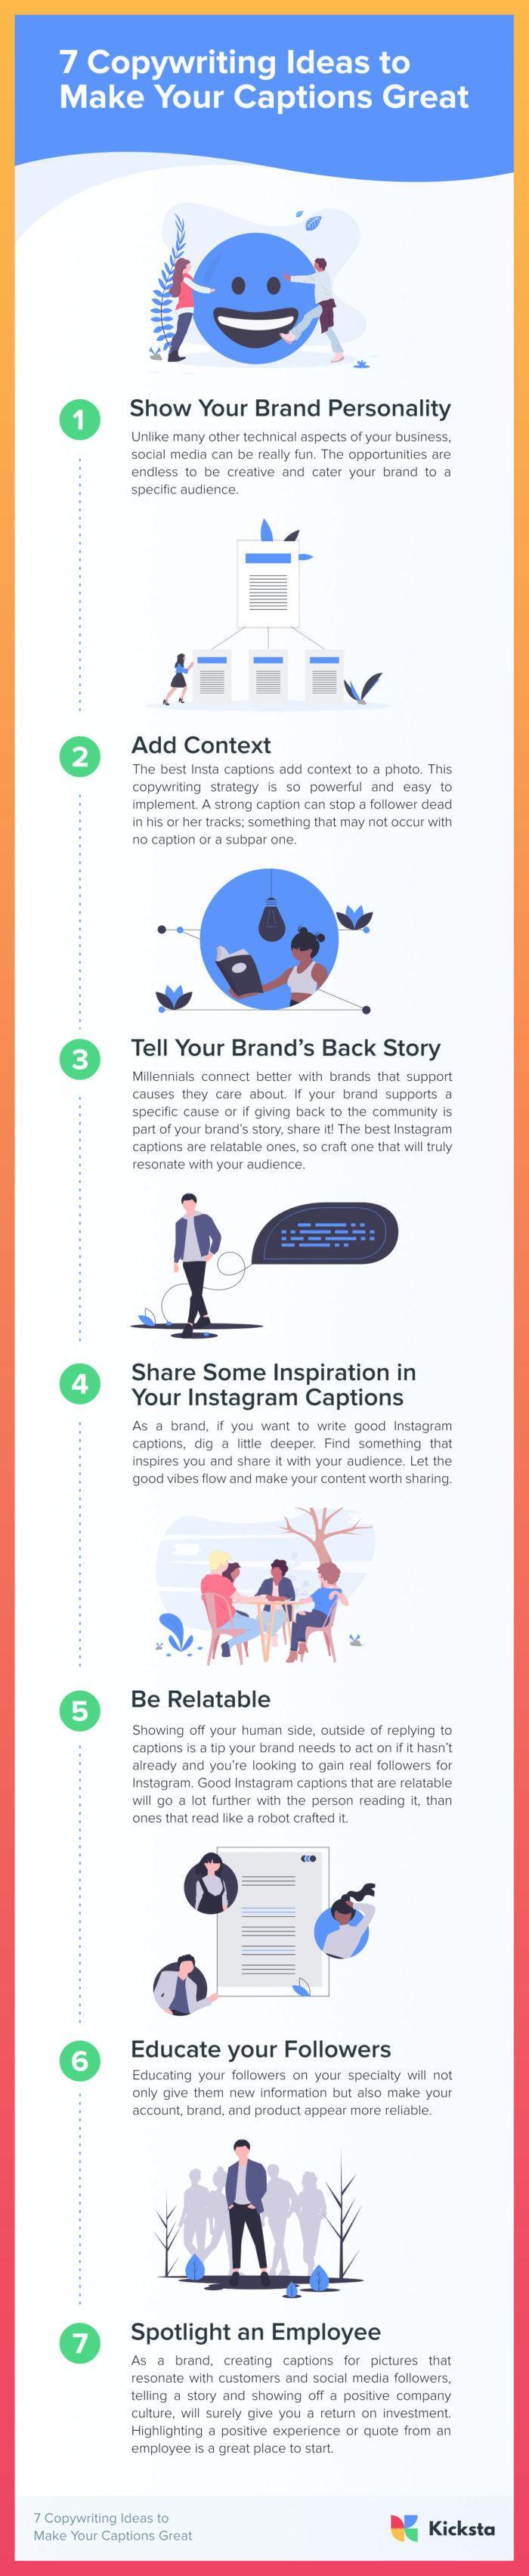 7-Copywriting-Ideas-Infographic-plaza